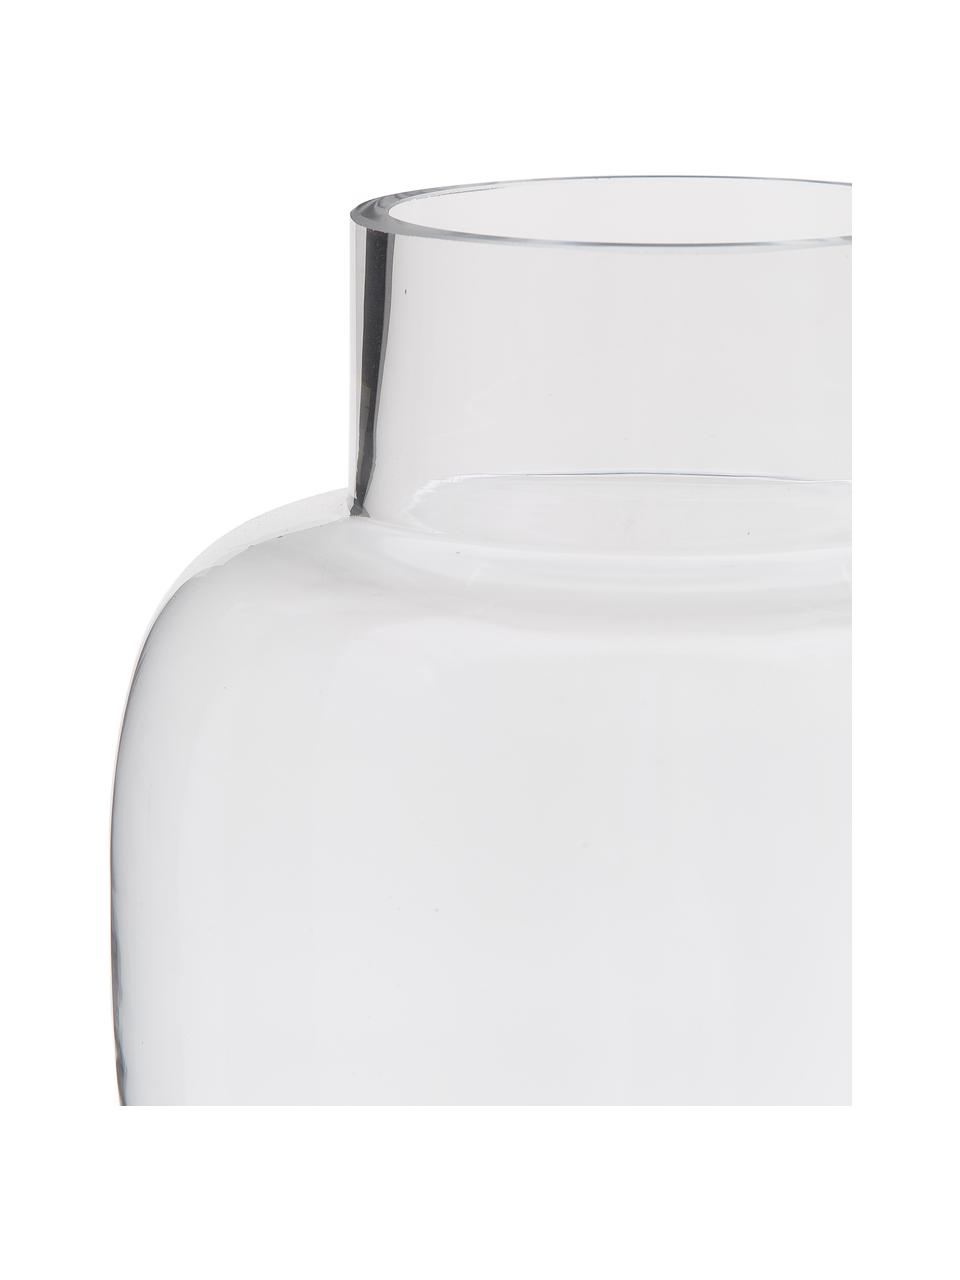 Vase Lotta, Glas, Transparent, Ø 18 x H 25 cm